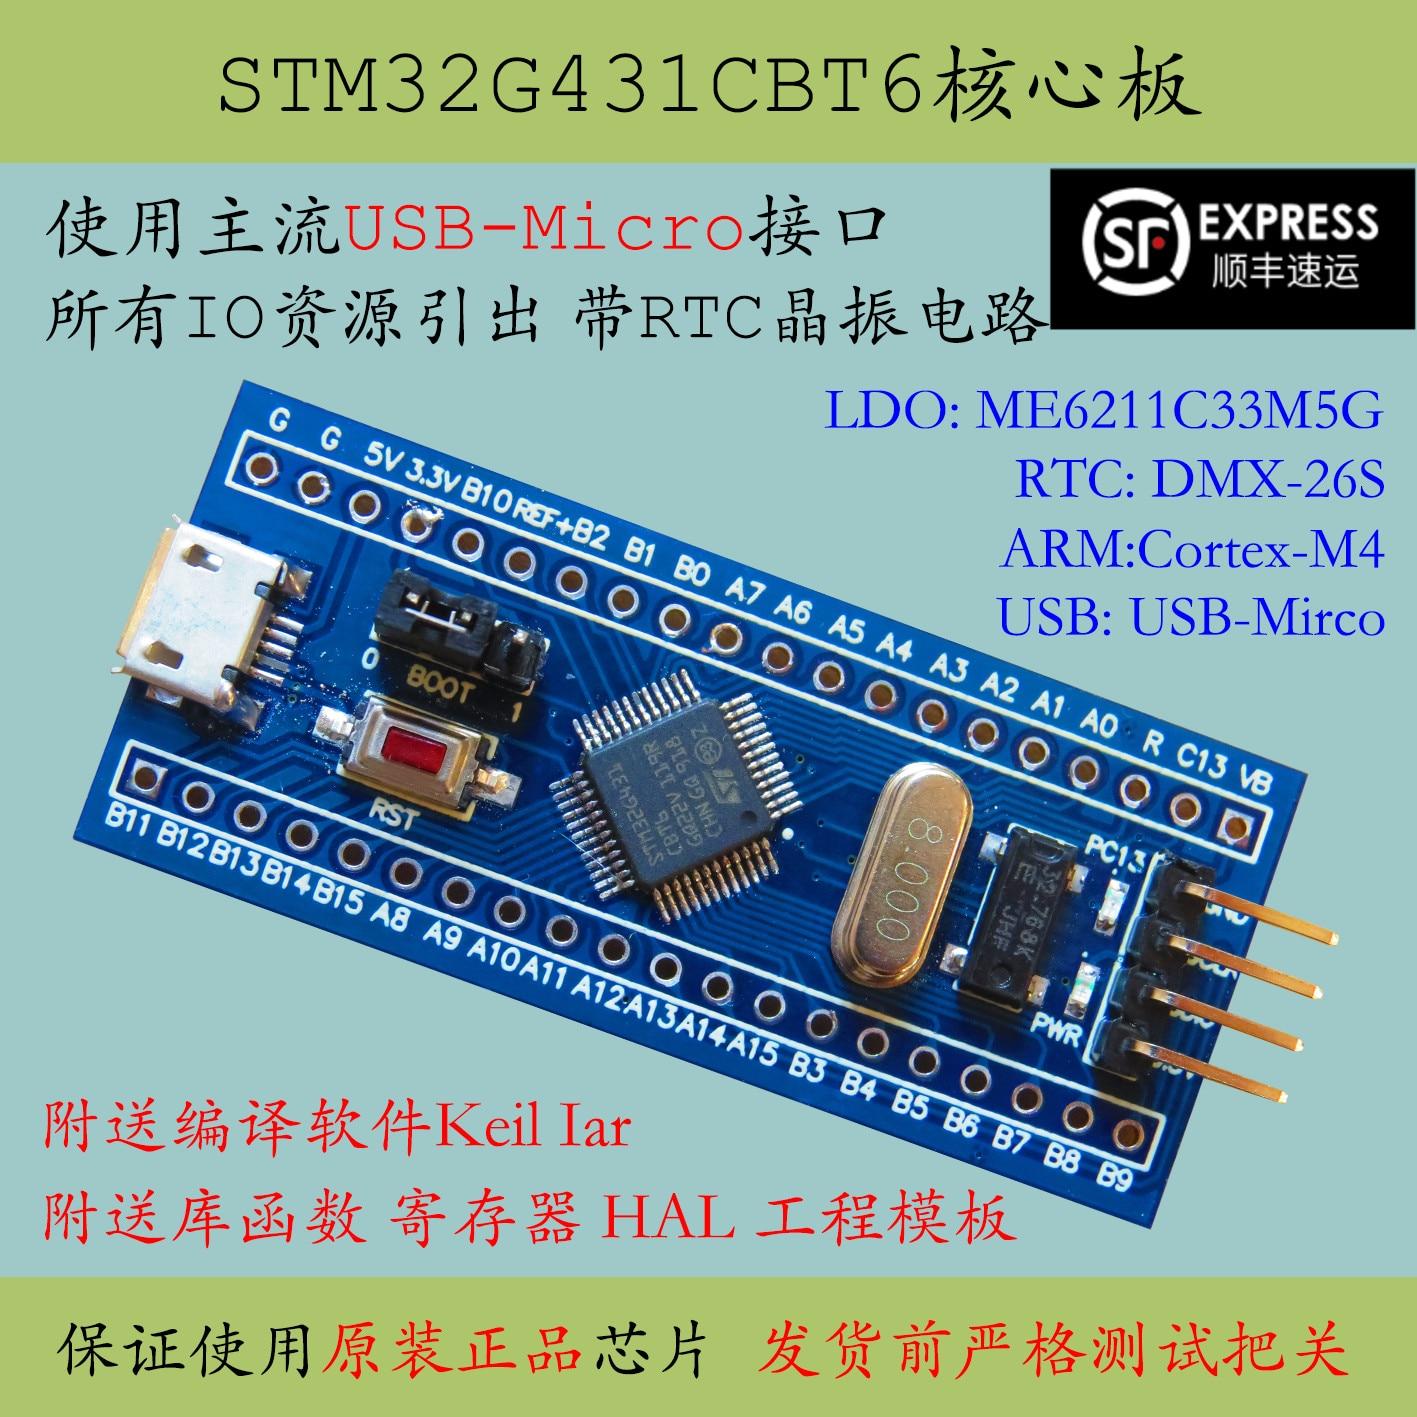 Stm32g431 Core Board Stm32g431cbt6 Minimum System Cortex-m4 New G4 Development Board USB